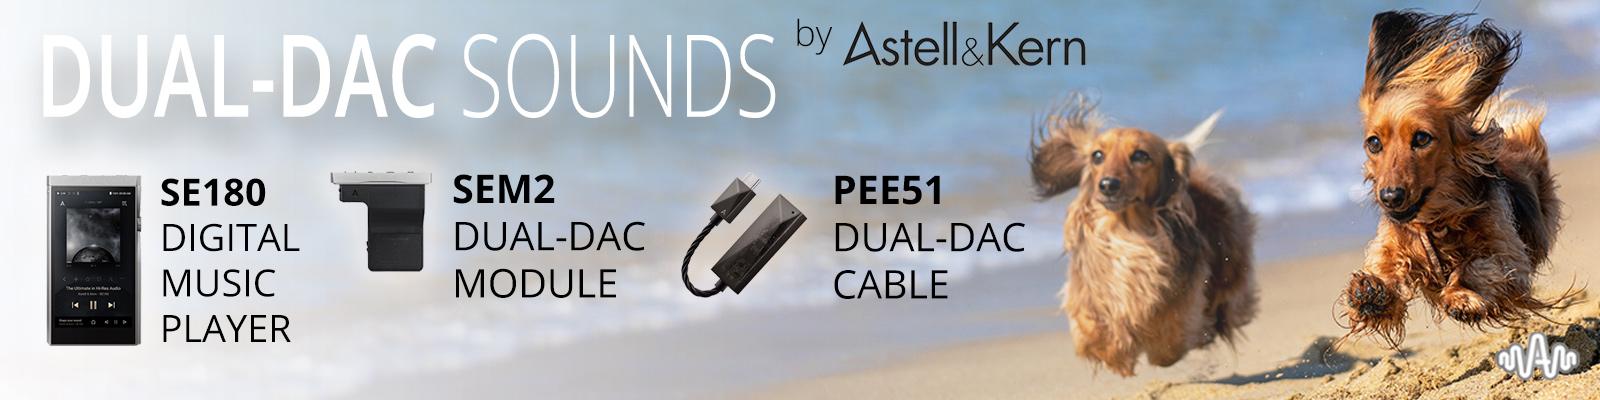 SE180, SEM2, PEE51 | Dual-DAC Sounds, by Astell&Kern